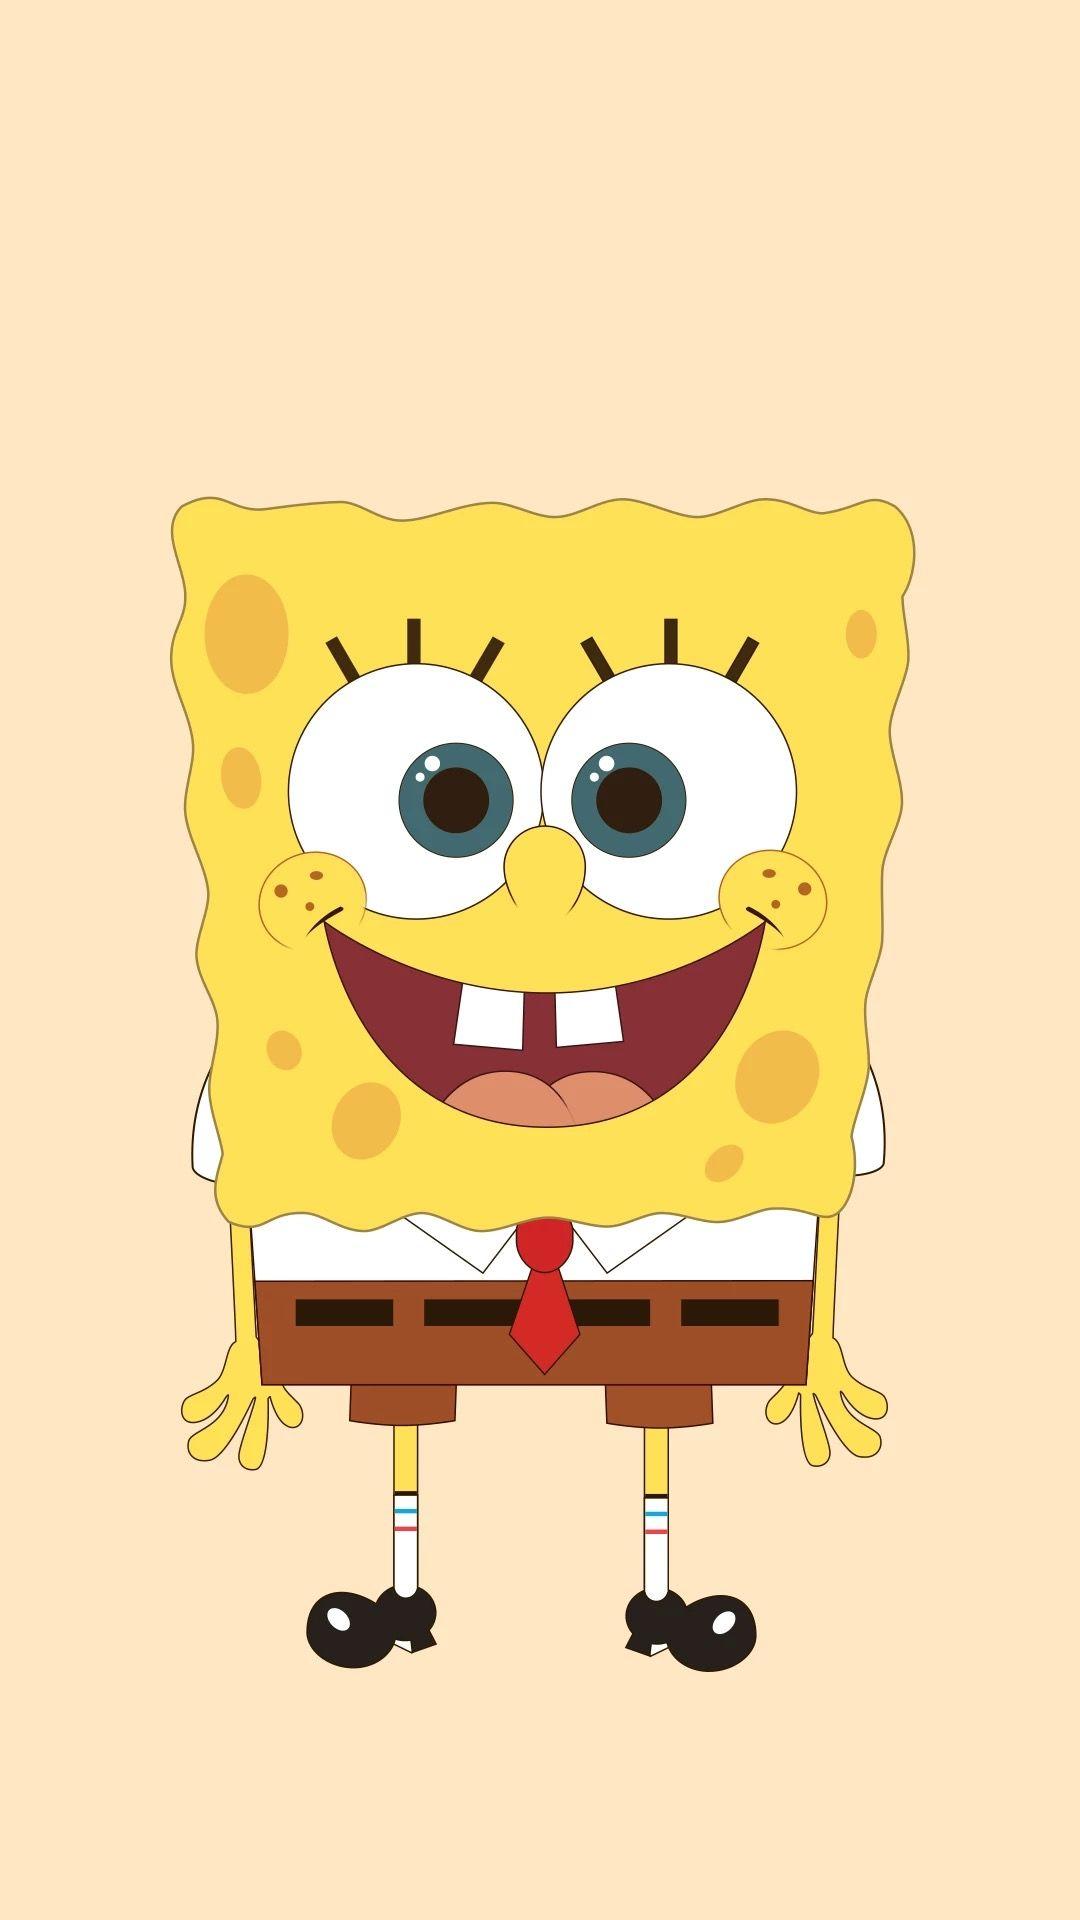 Spongebob Aesthetic Phone Wallpapers 3 Fondos de